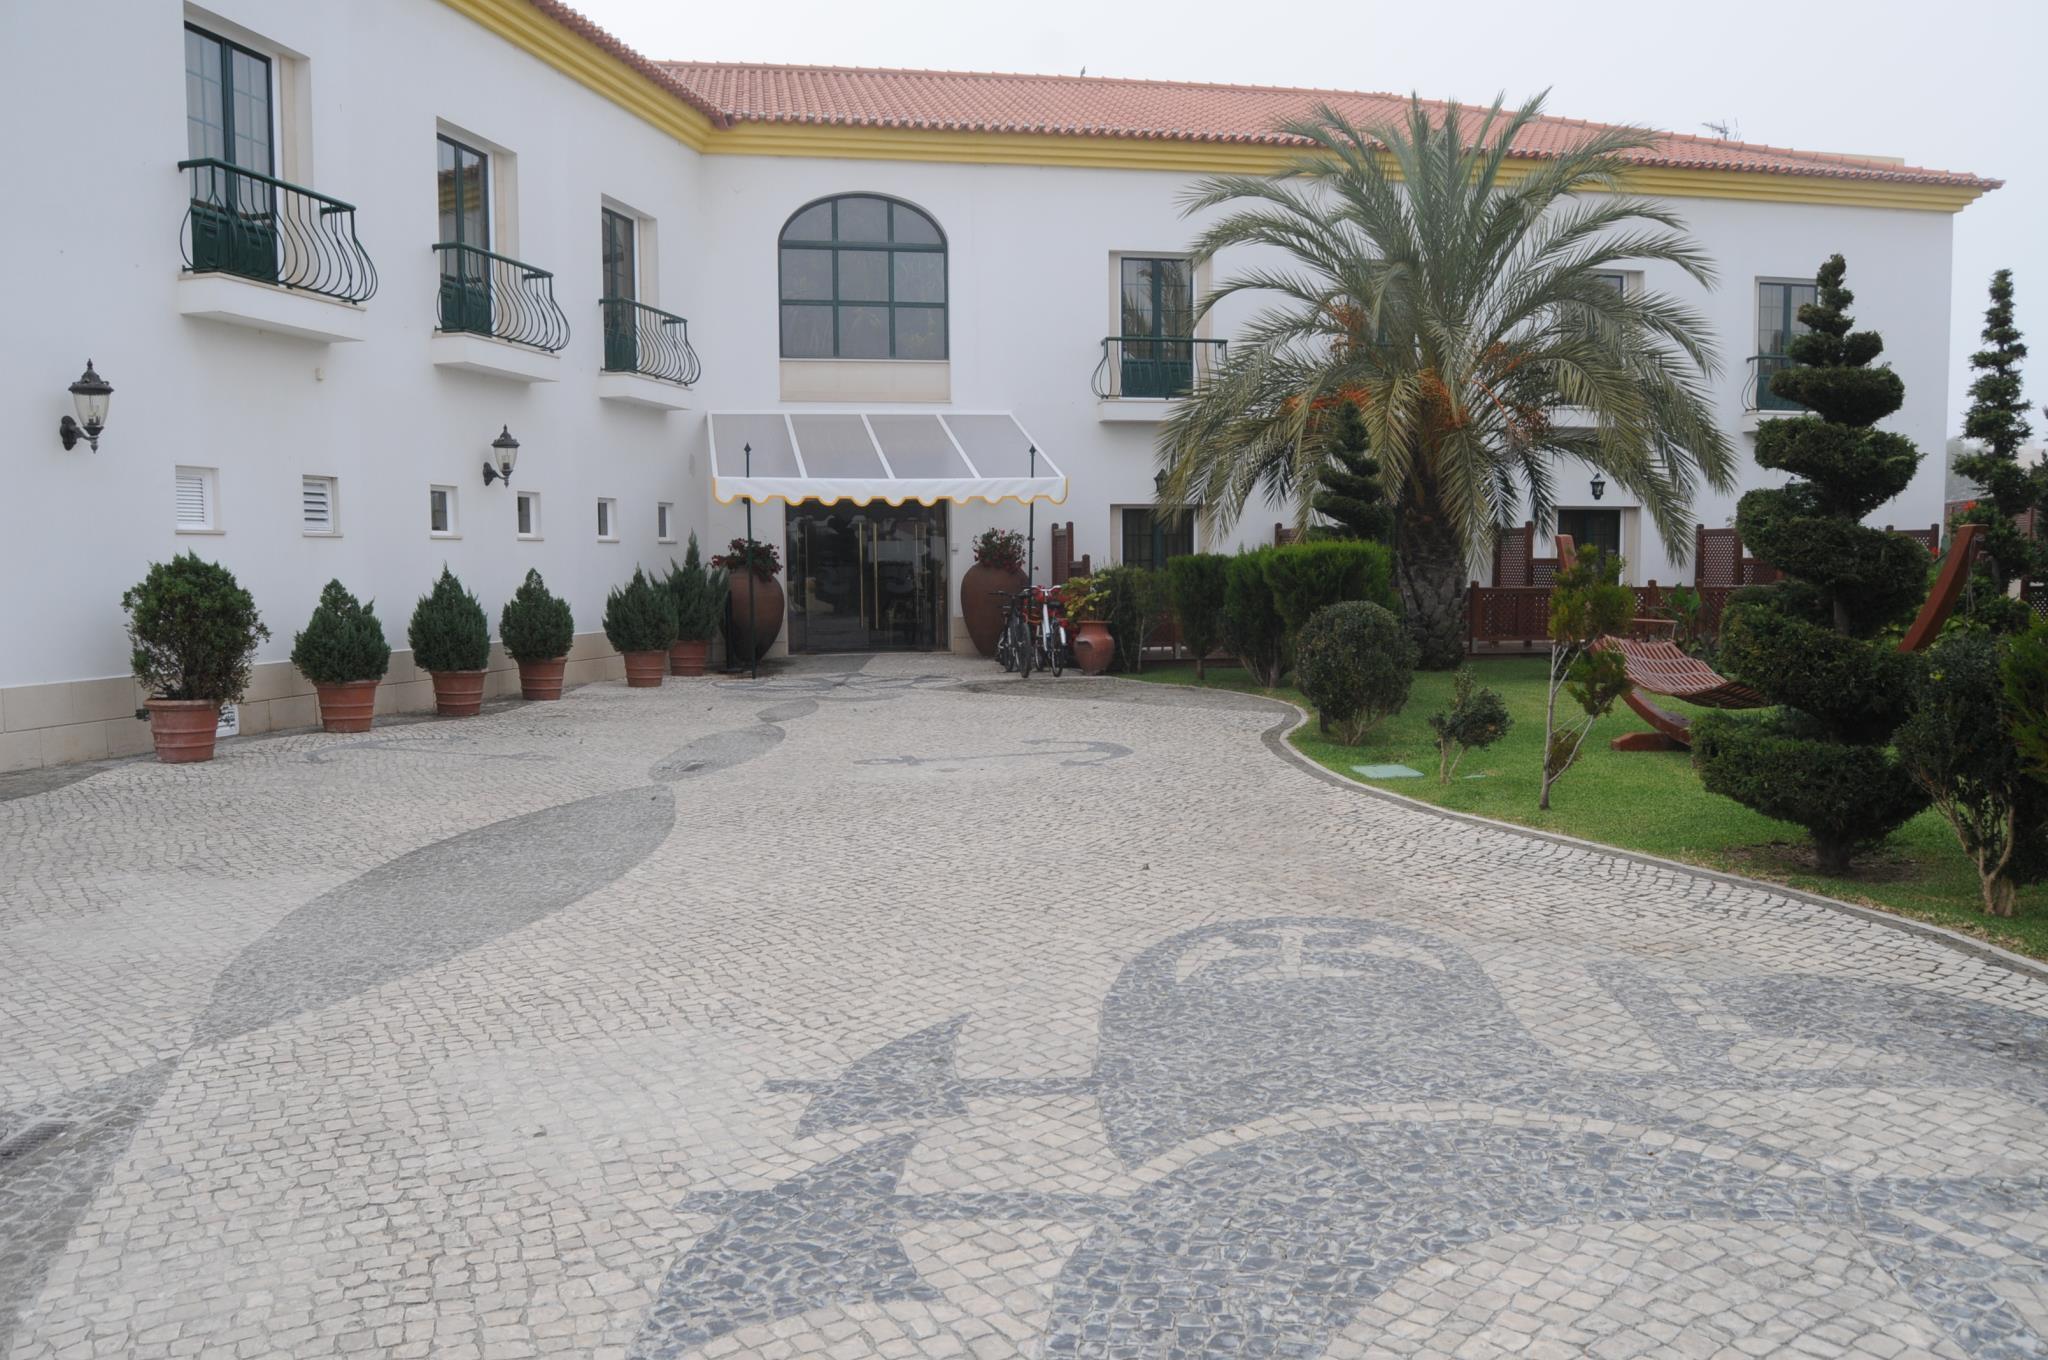 Hotel Dom Vasco Sines